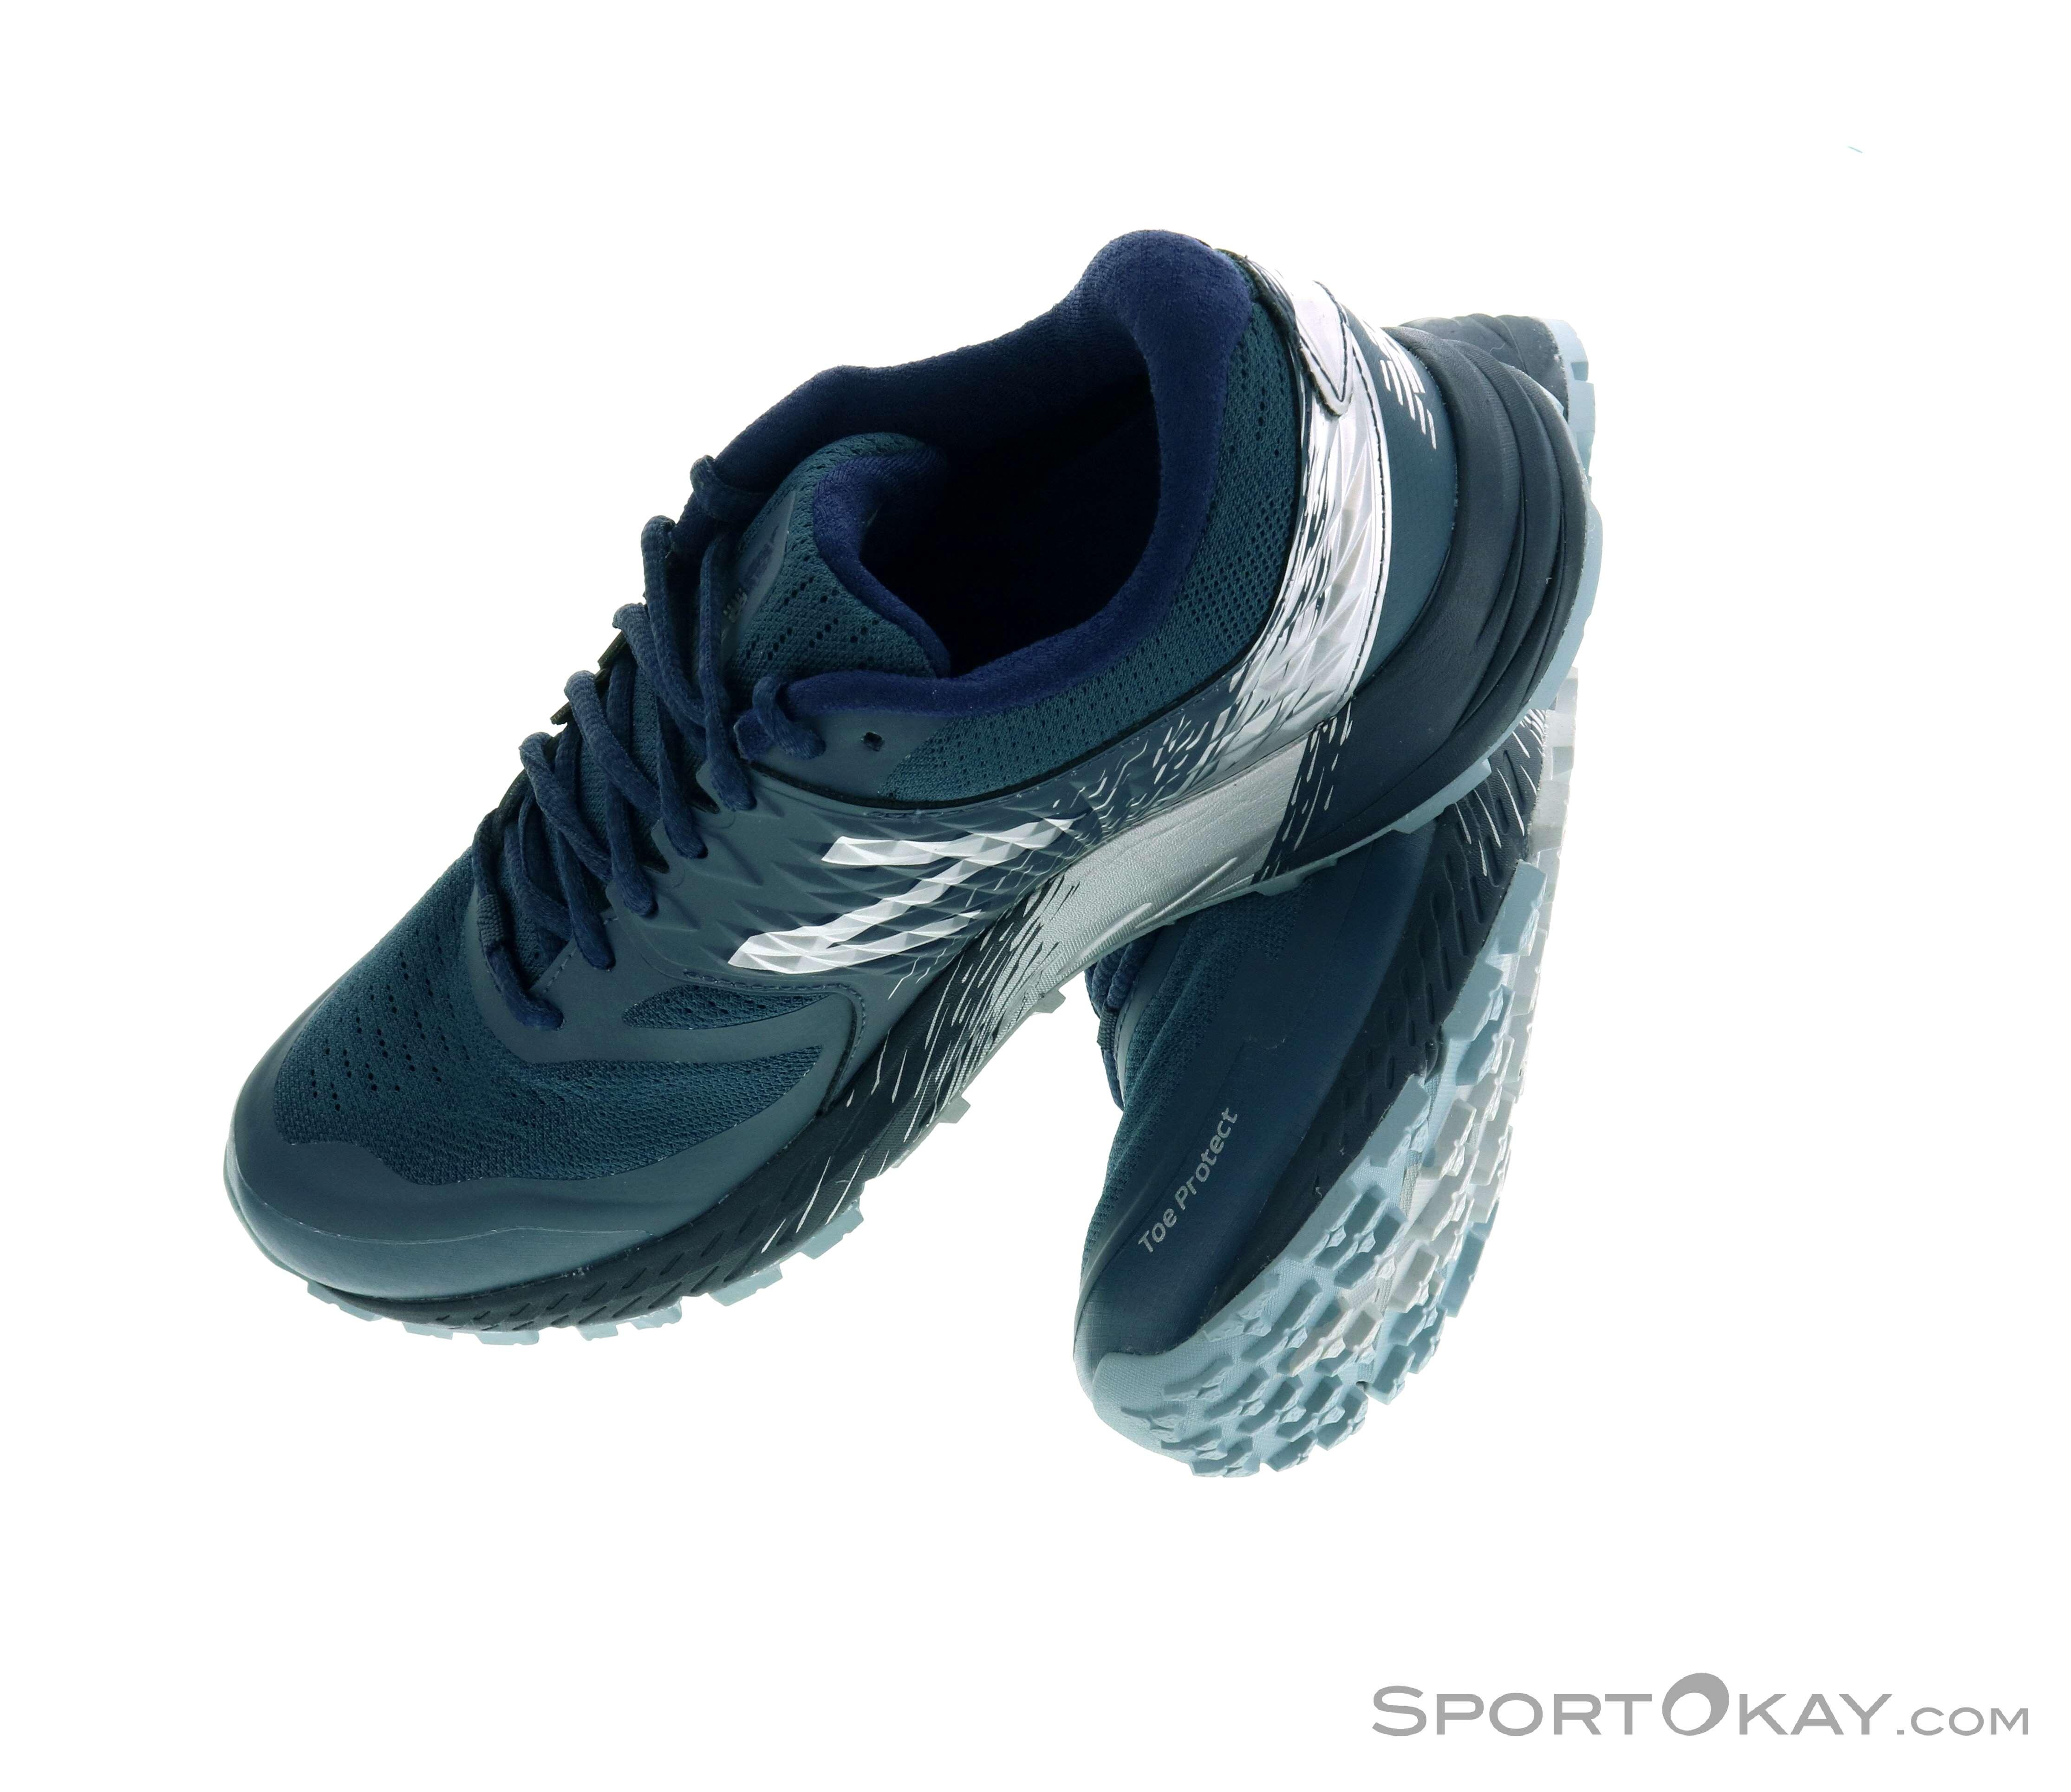 salomon xa elevate gore-tex trail running shoes review guardian